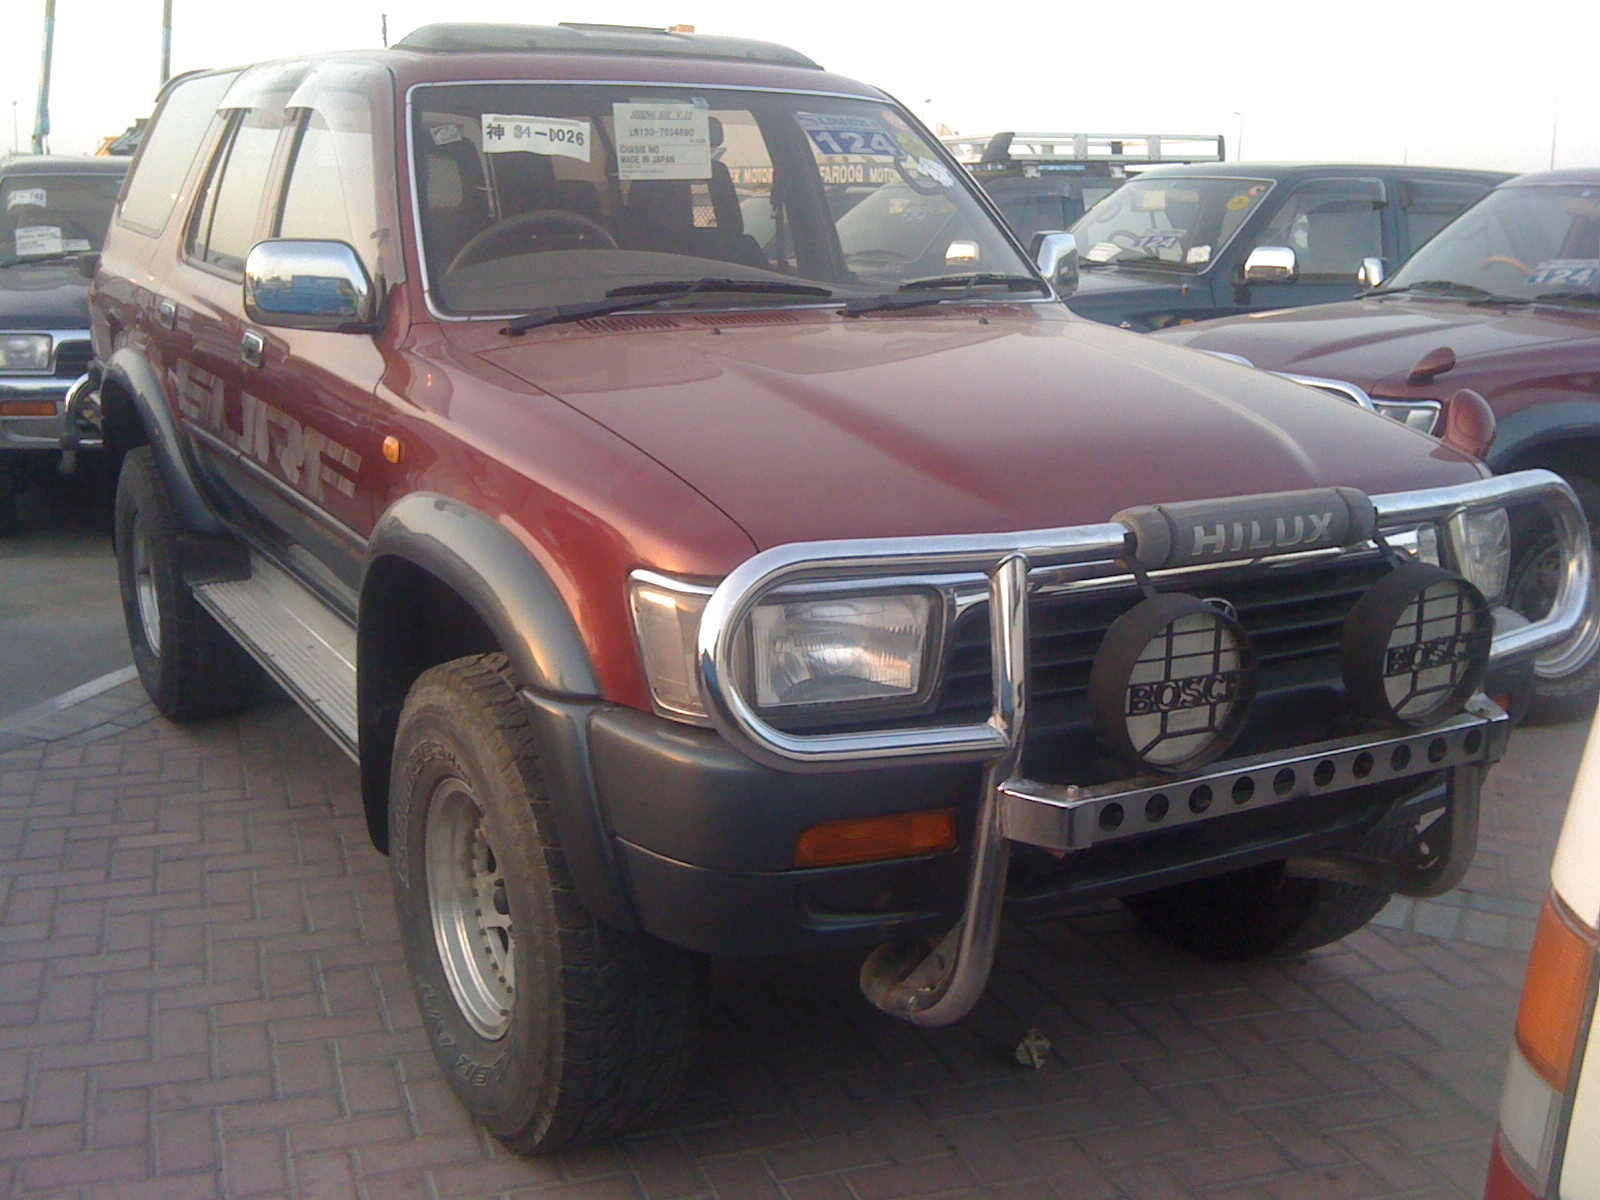 Kota Ganate's Truck